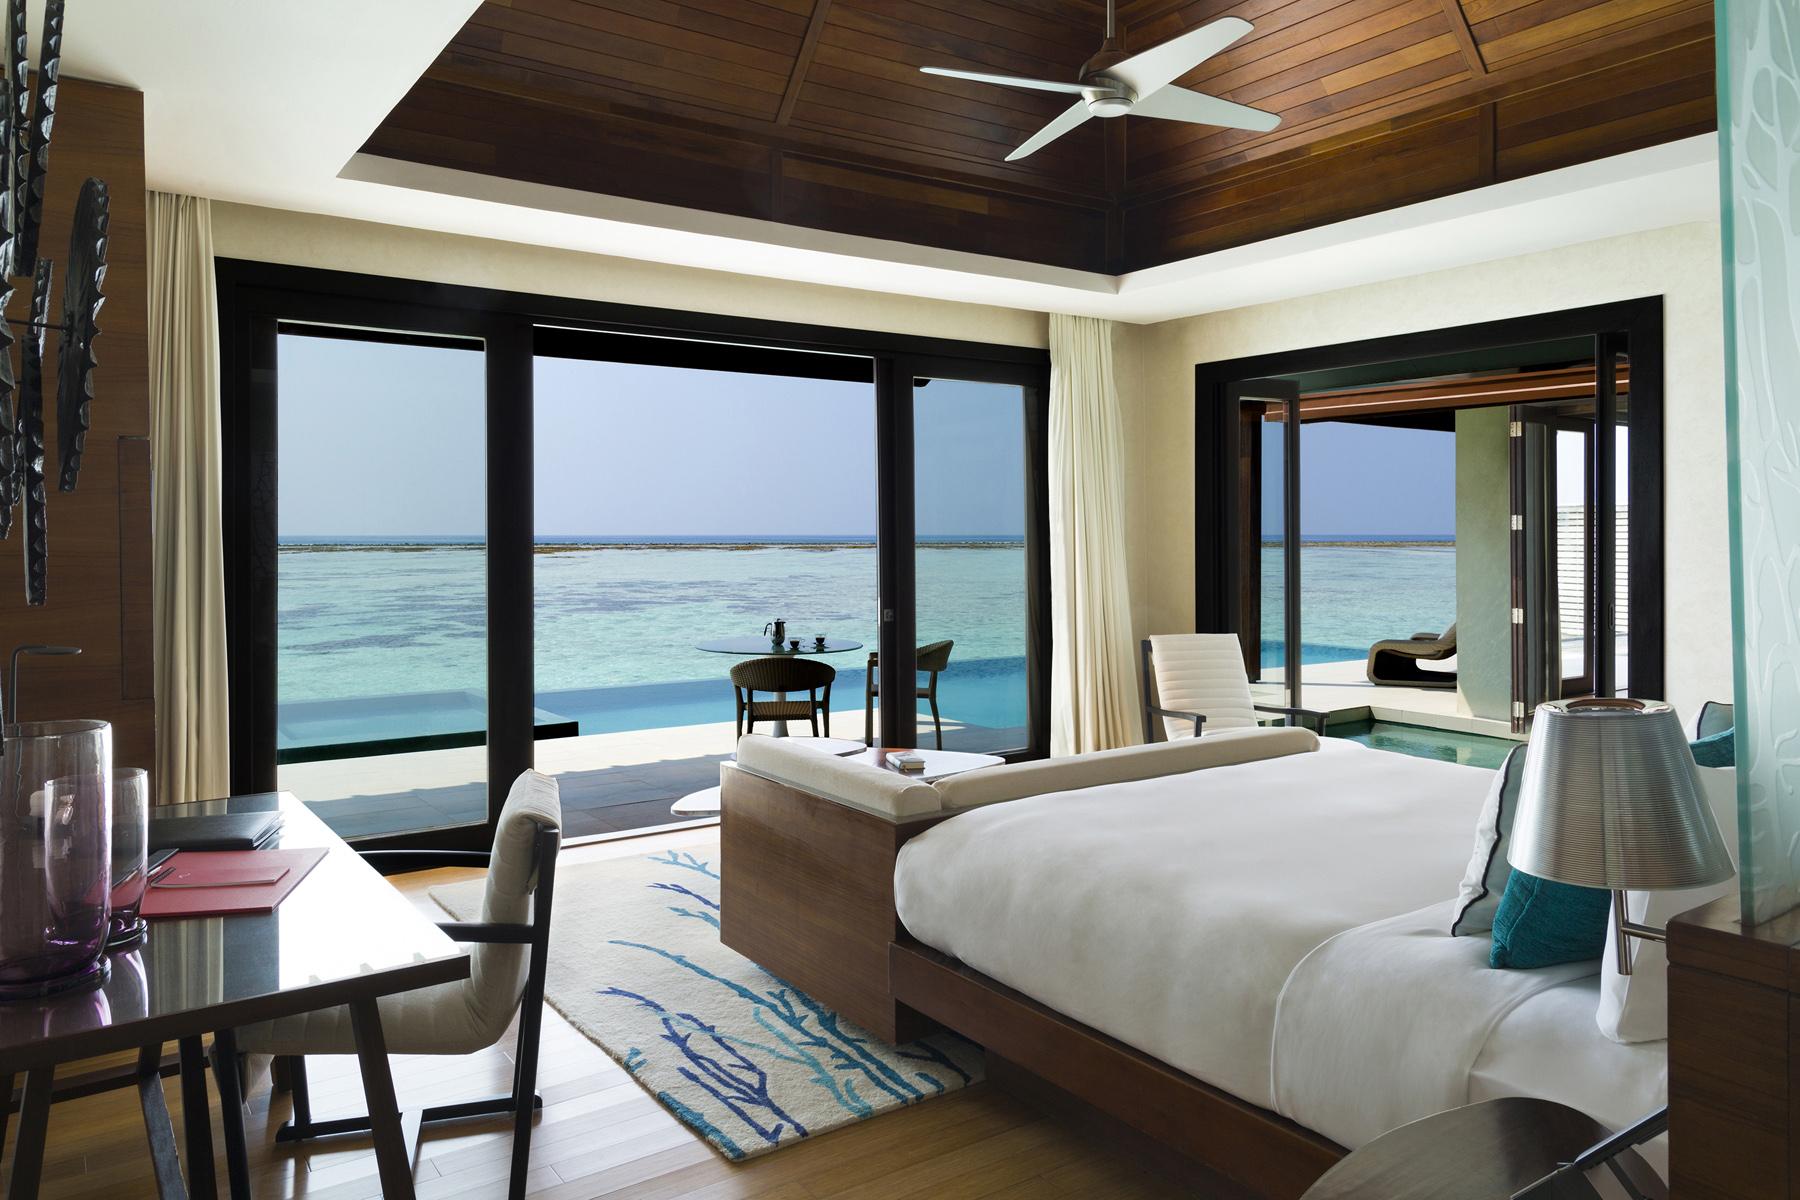 Resort Maldive Niyama per Aquum Resort one bedroom water pavillon with pool